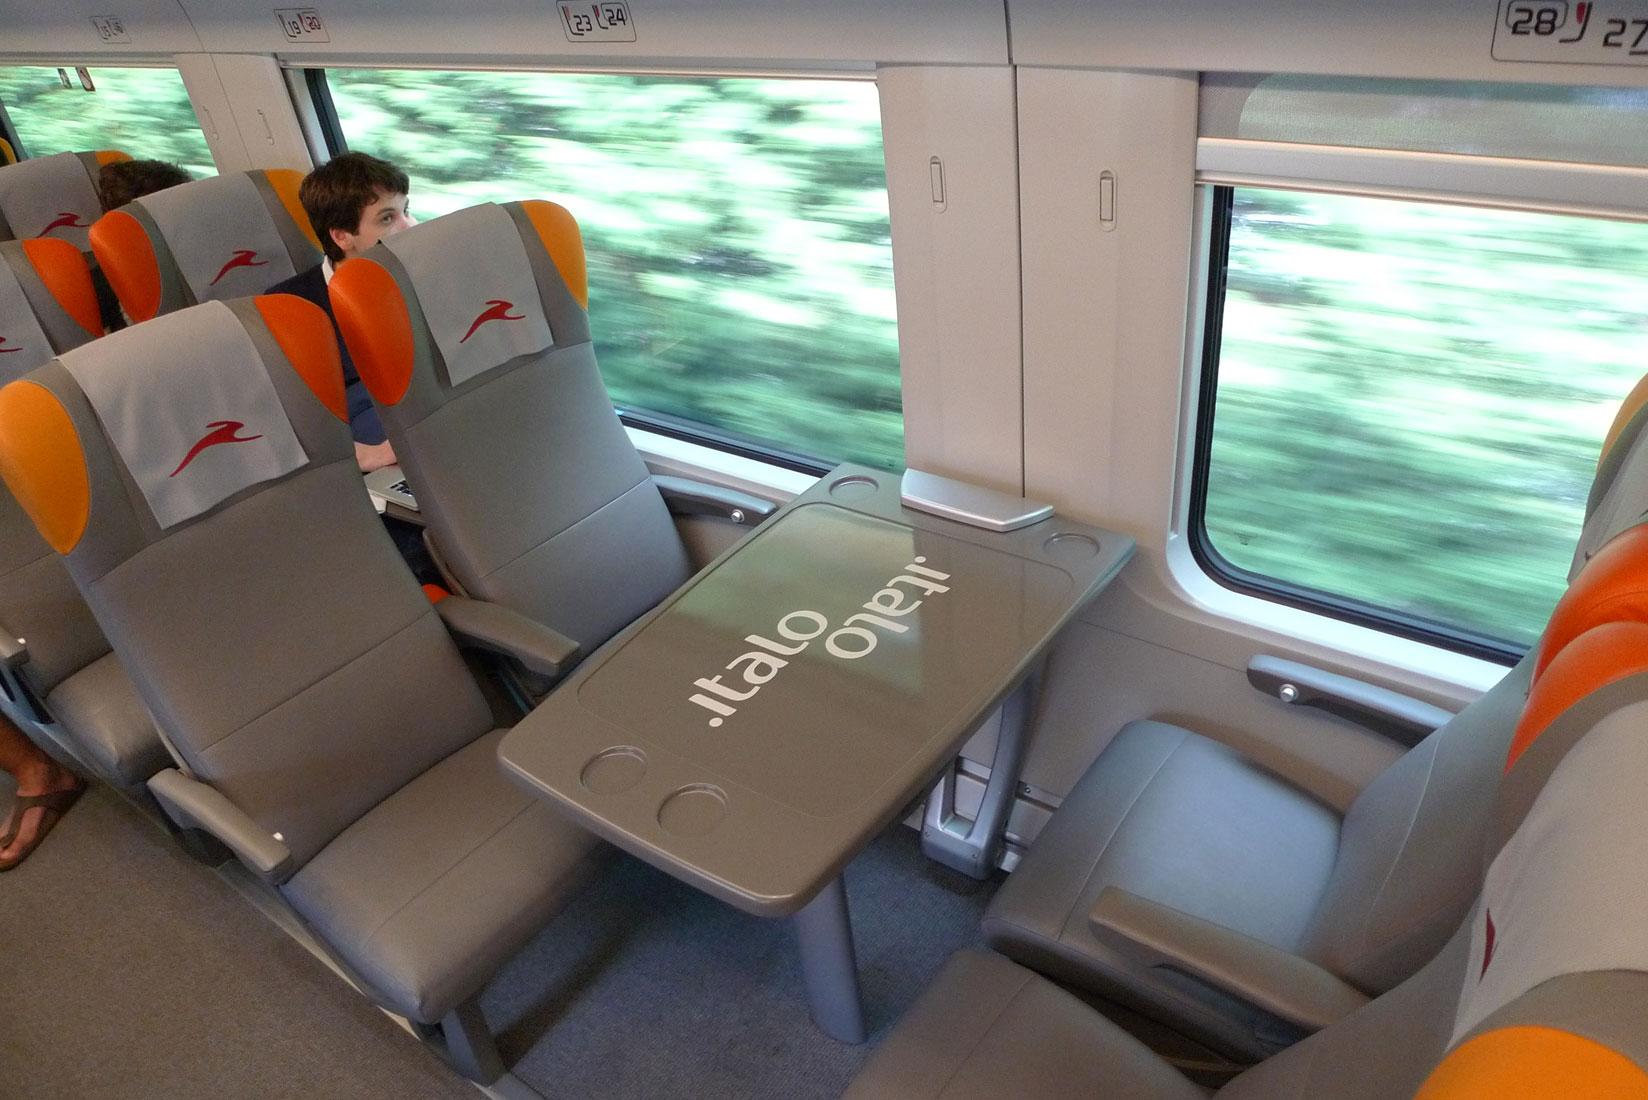 Fabulous Italo Trains Italo Tickets From 15 Beatyapartments Chair Design Images Beatyapartmentscom